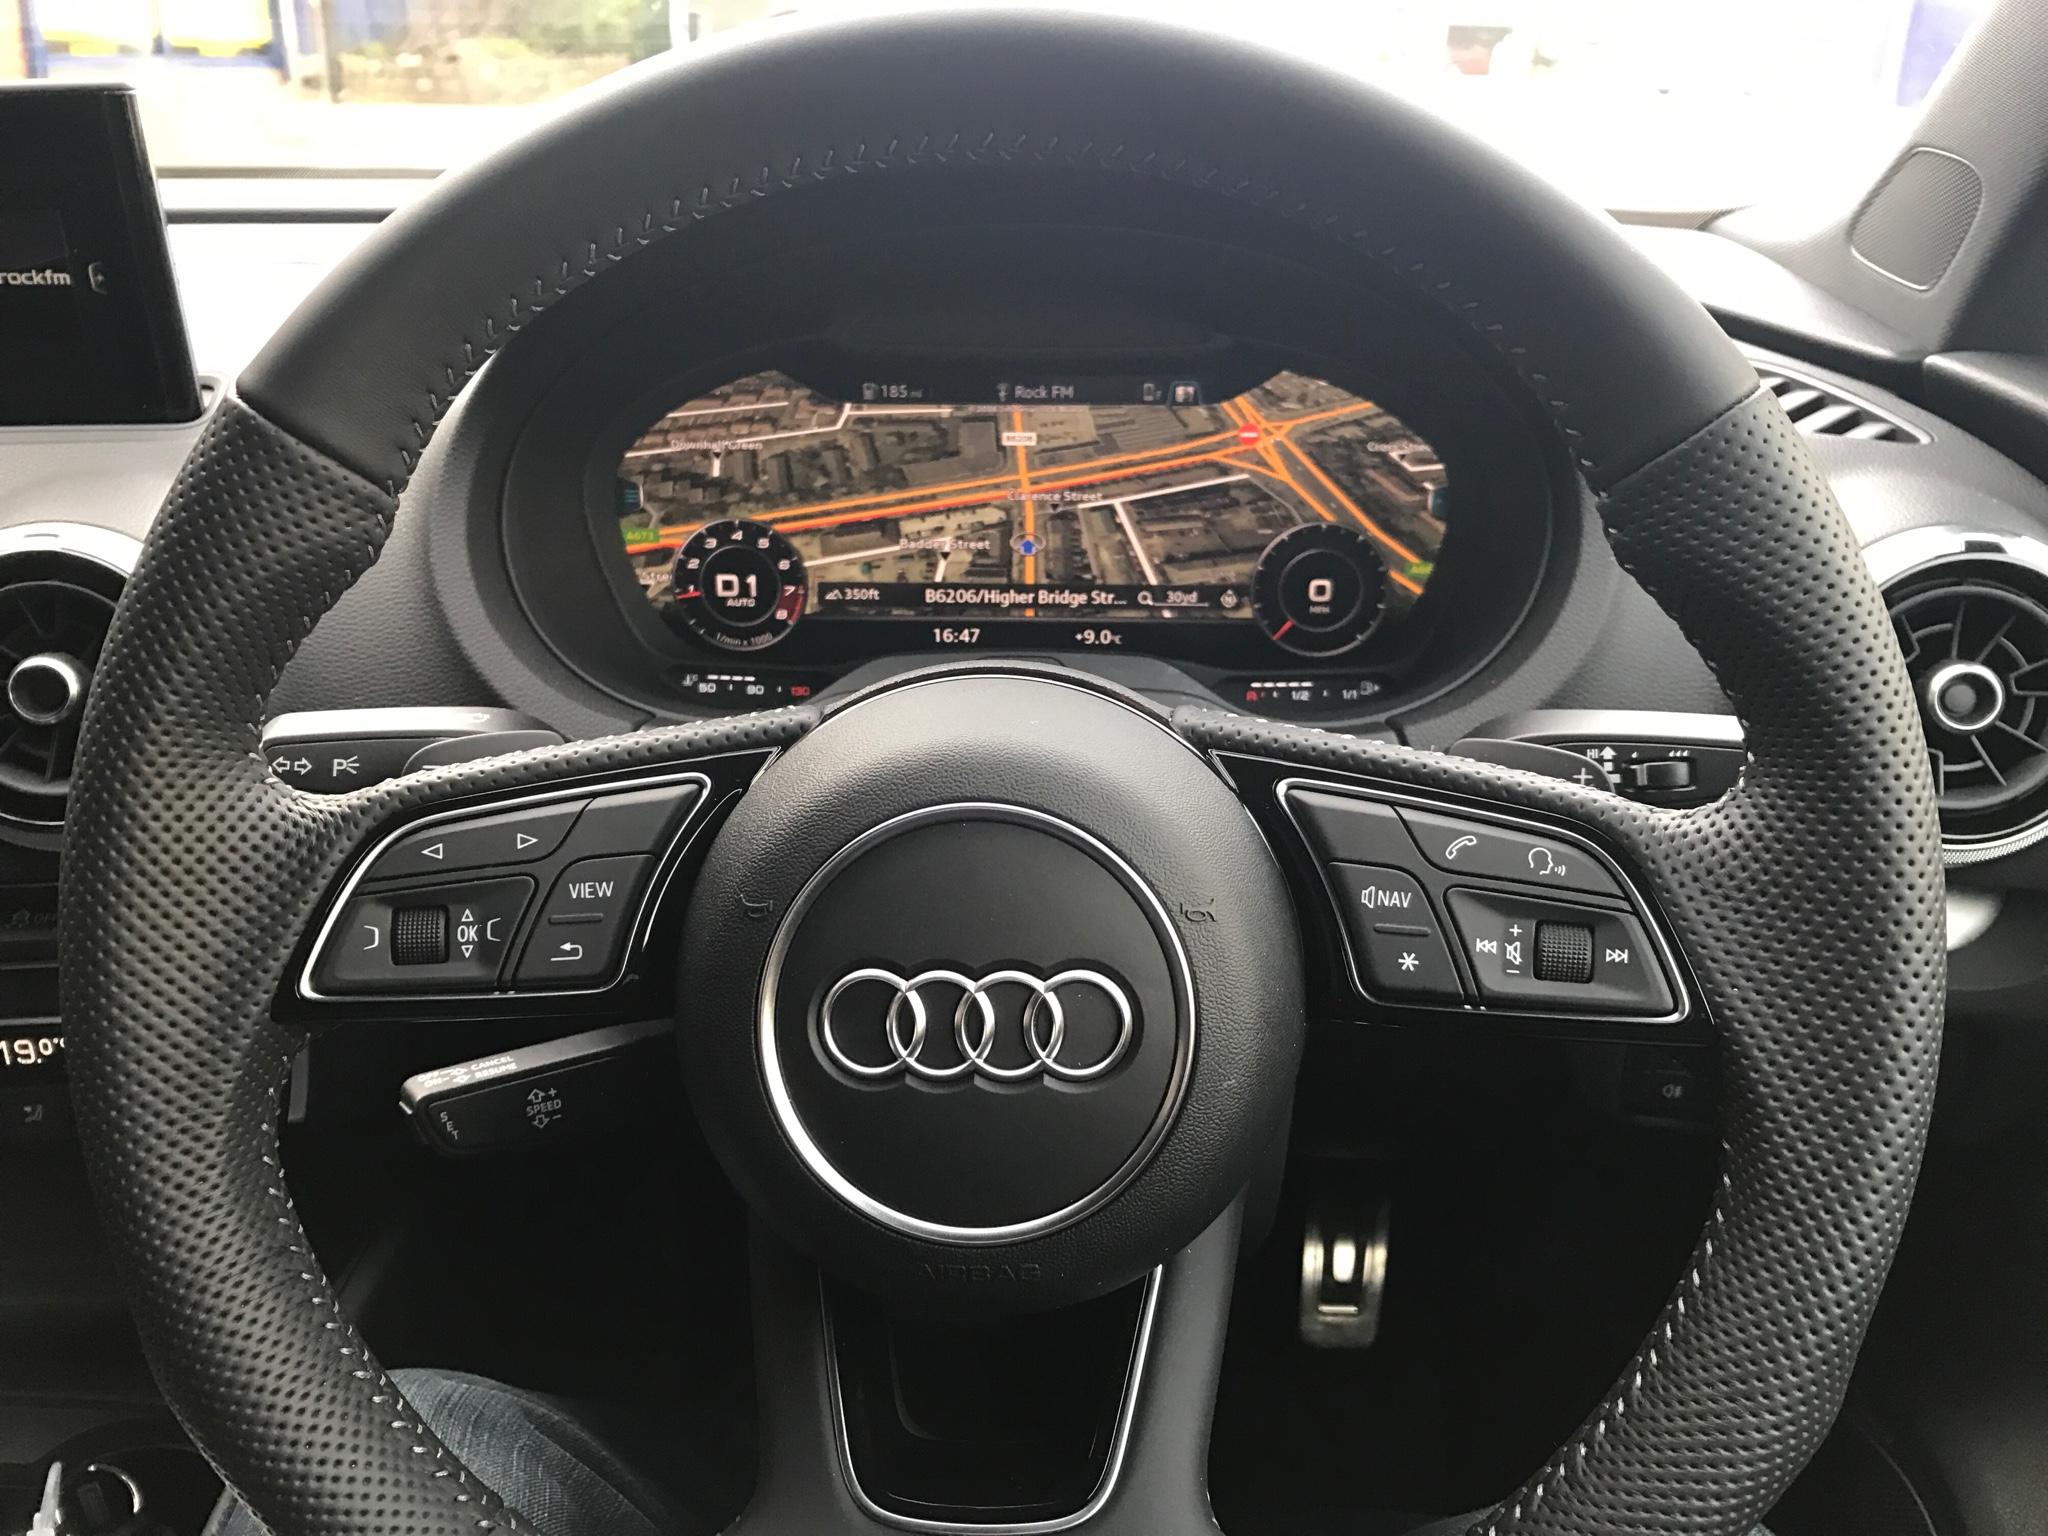 Facelift - Virtual Cockpit Cleaning | Audi-Sport.net